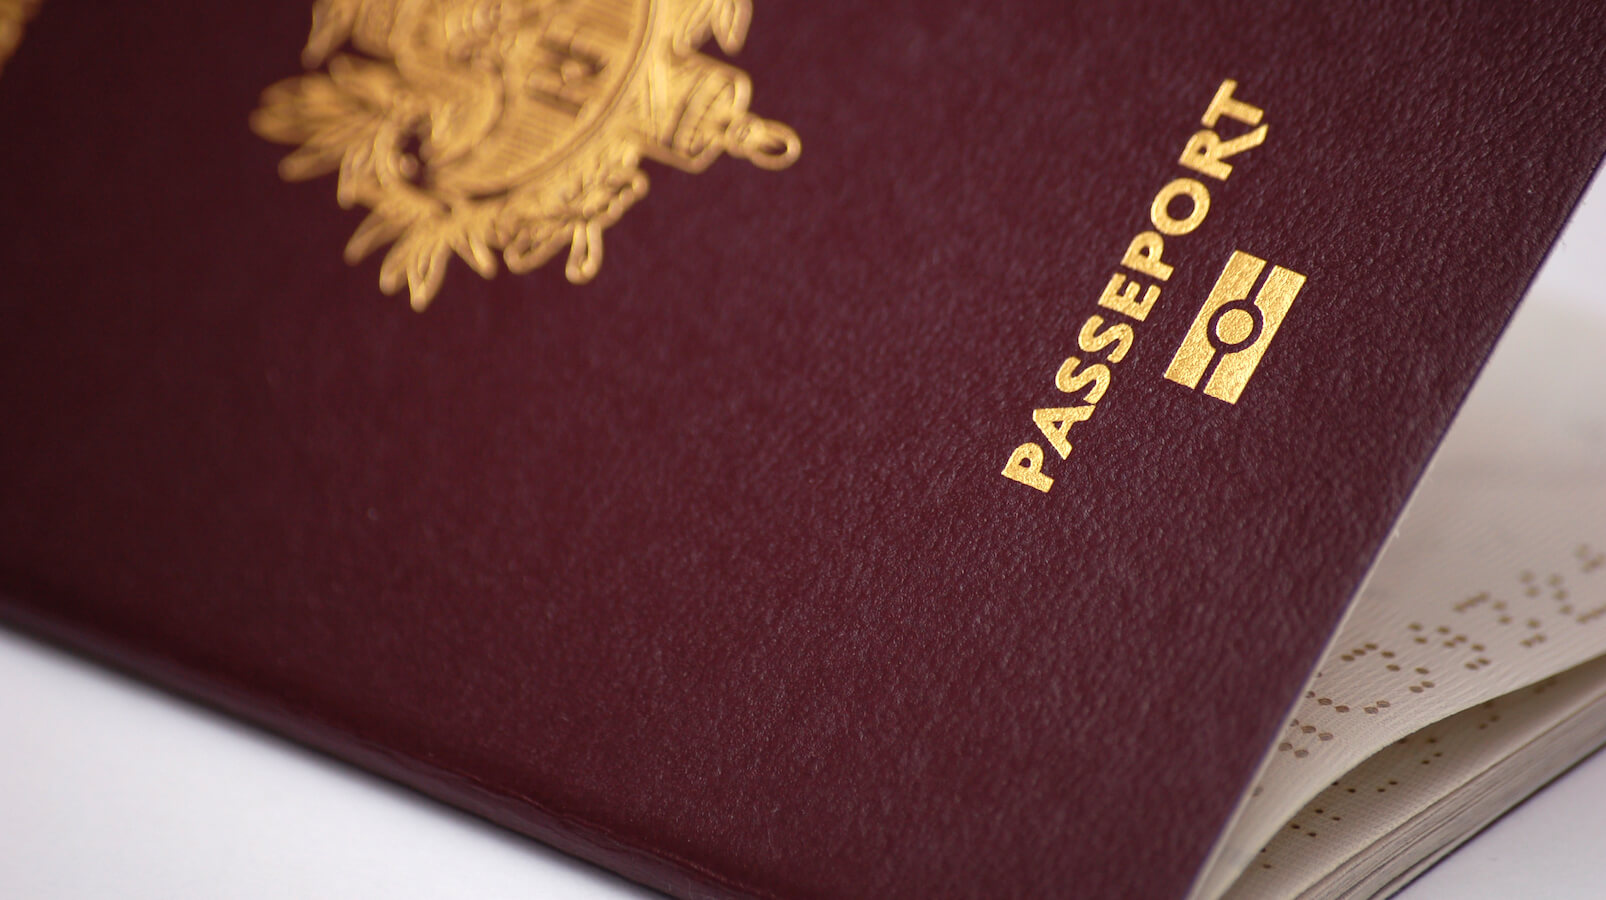 Сдача биометрии на визу во Францию